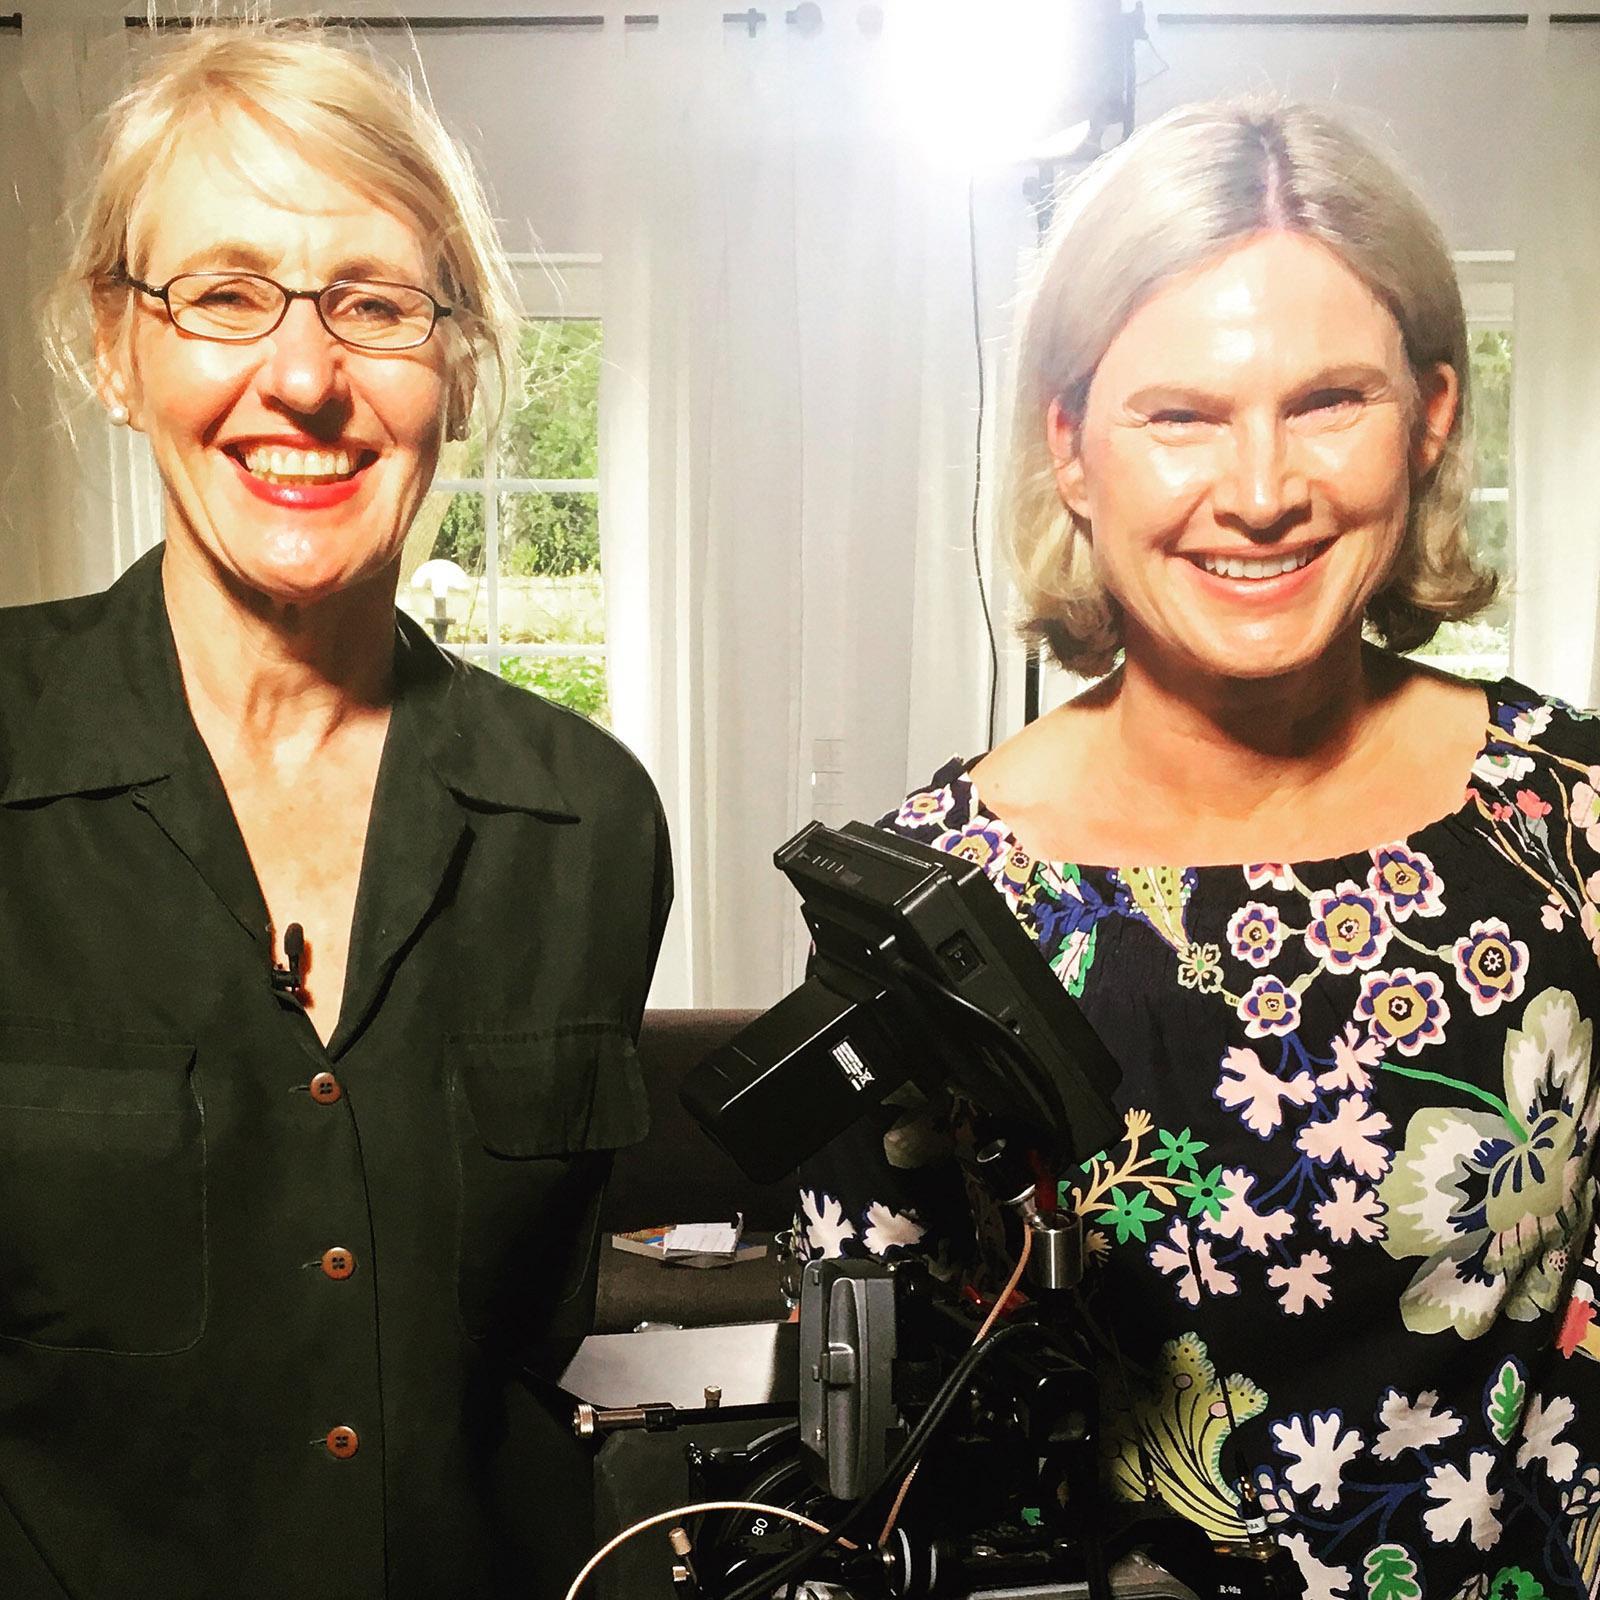 Sophie Bonnet beim Salongespräch mit Hilke Maunder. Foto: Lara Maunder